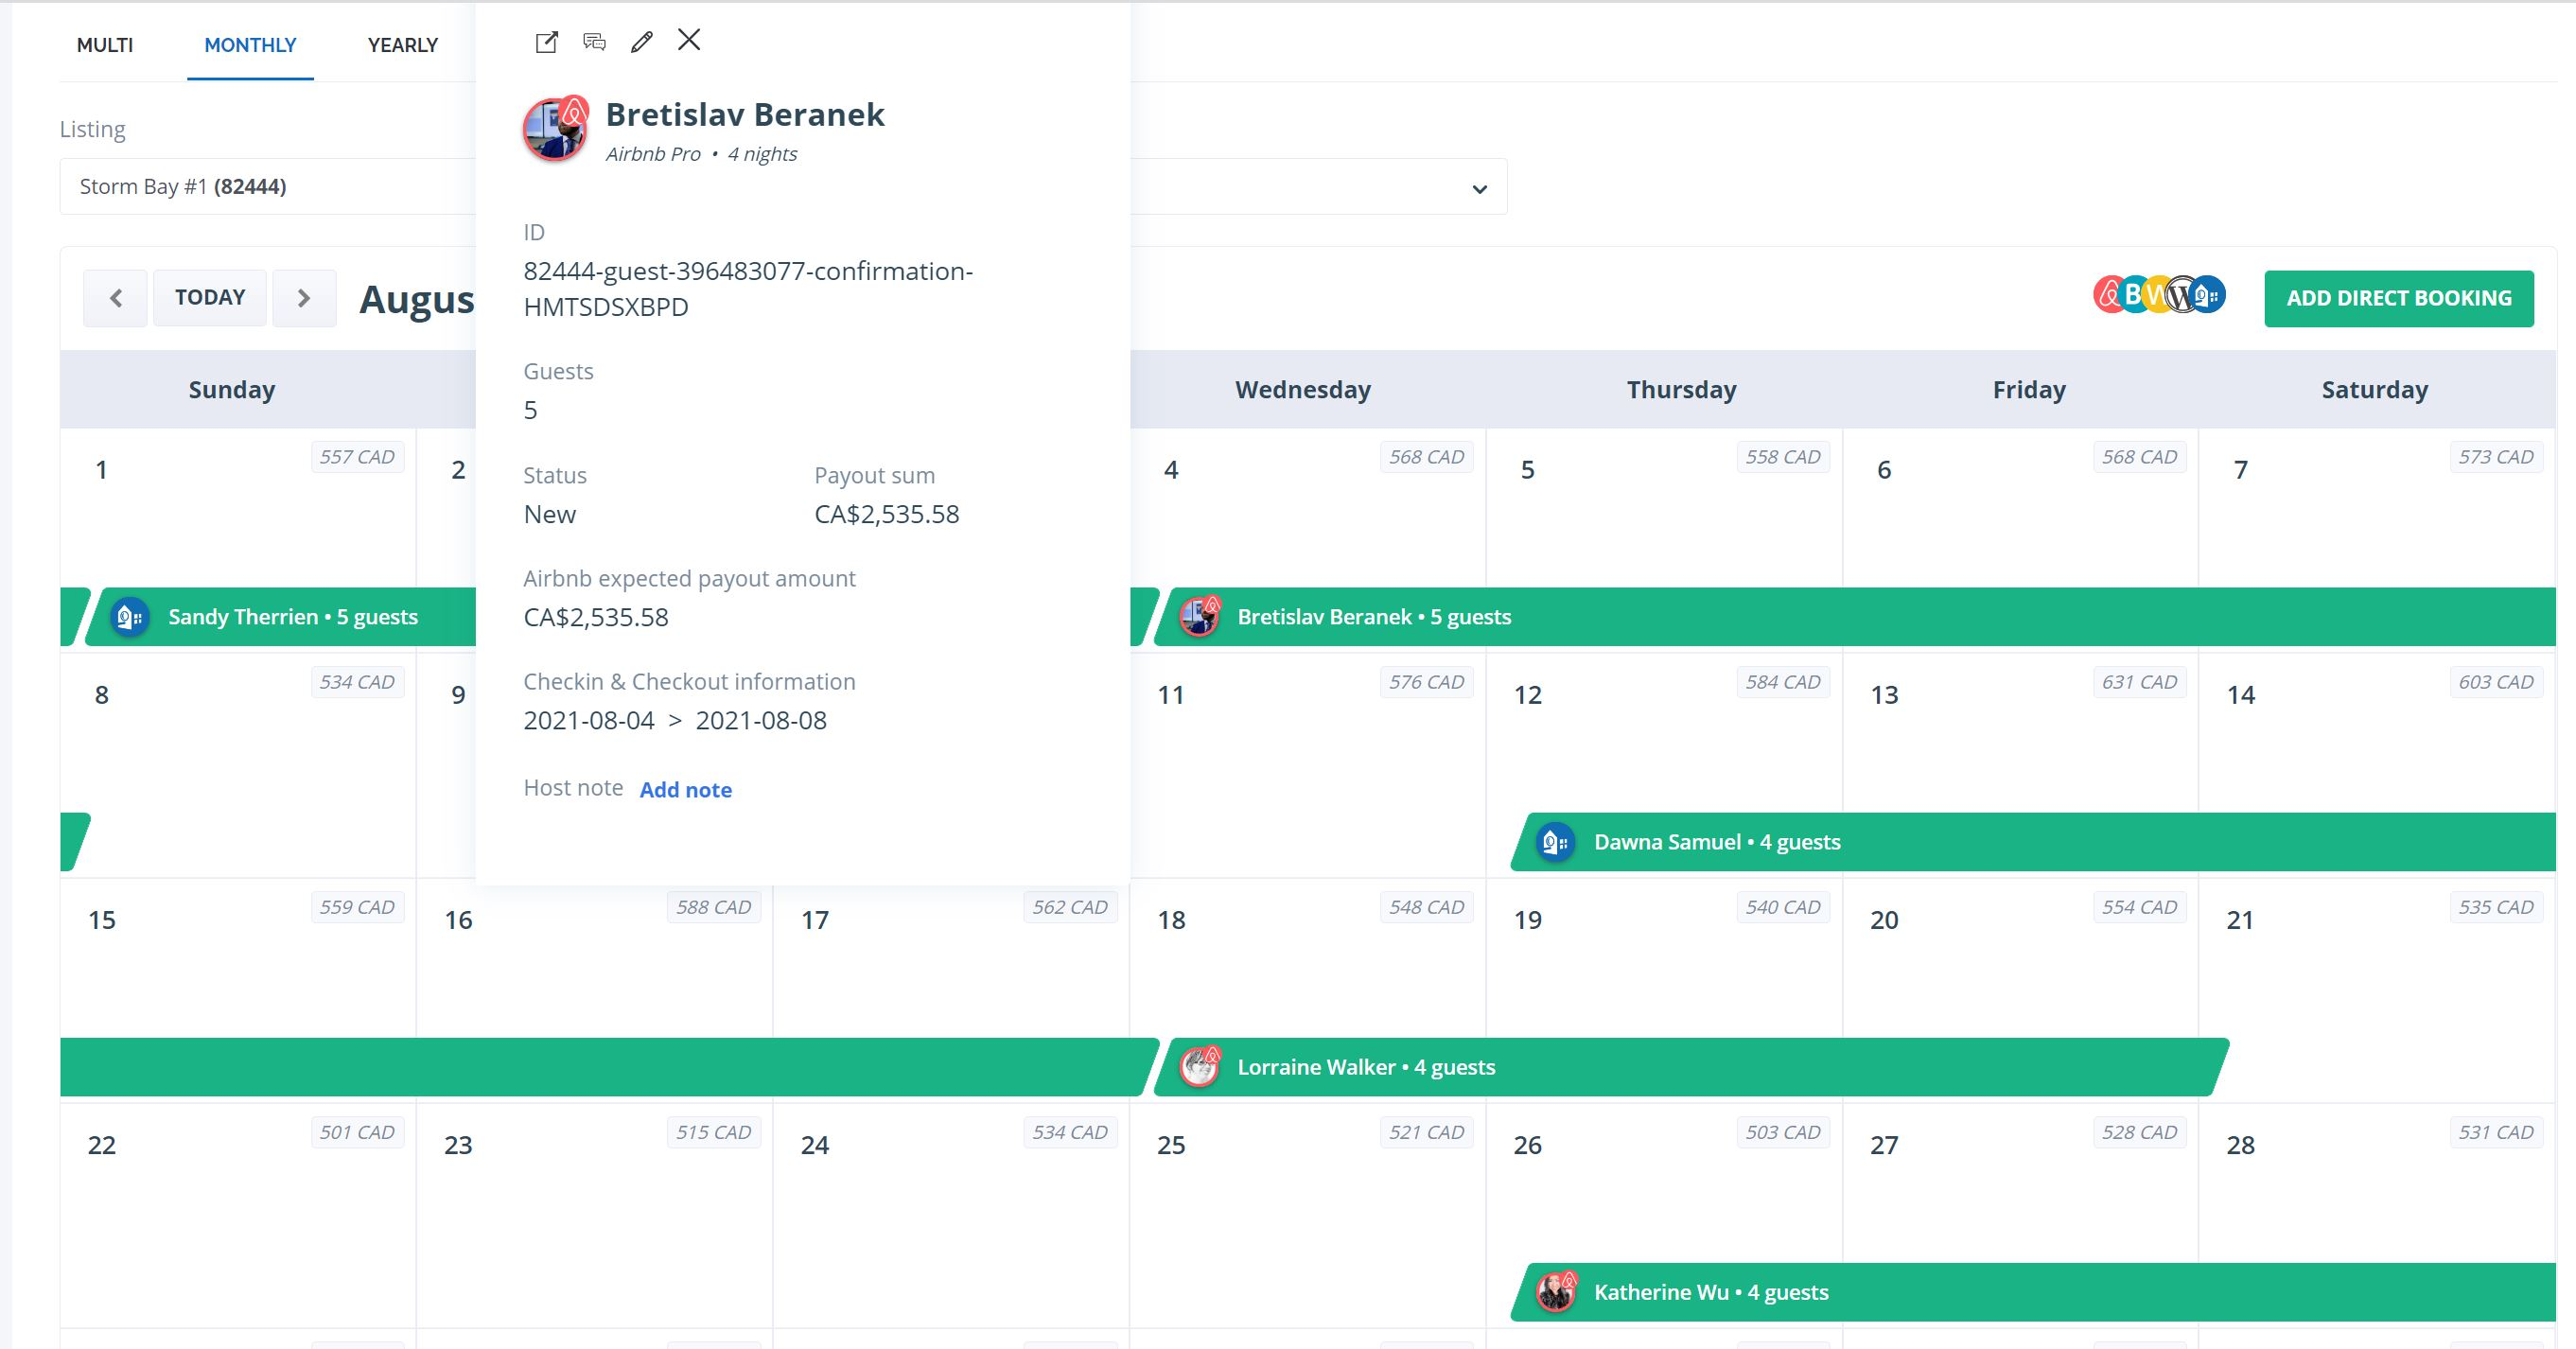 Hostaway - Multi-Calendar